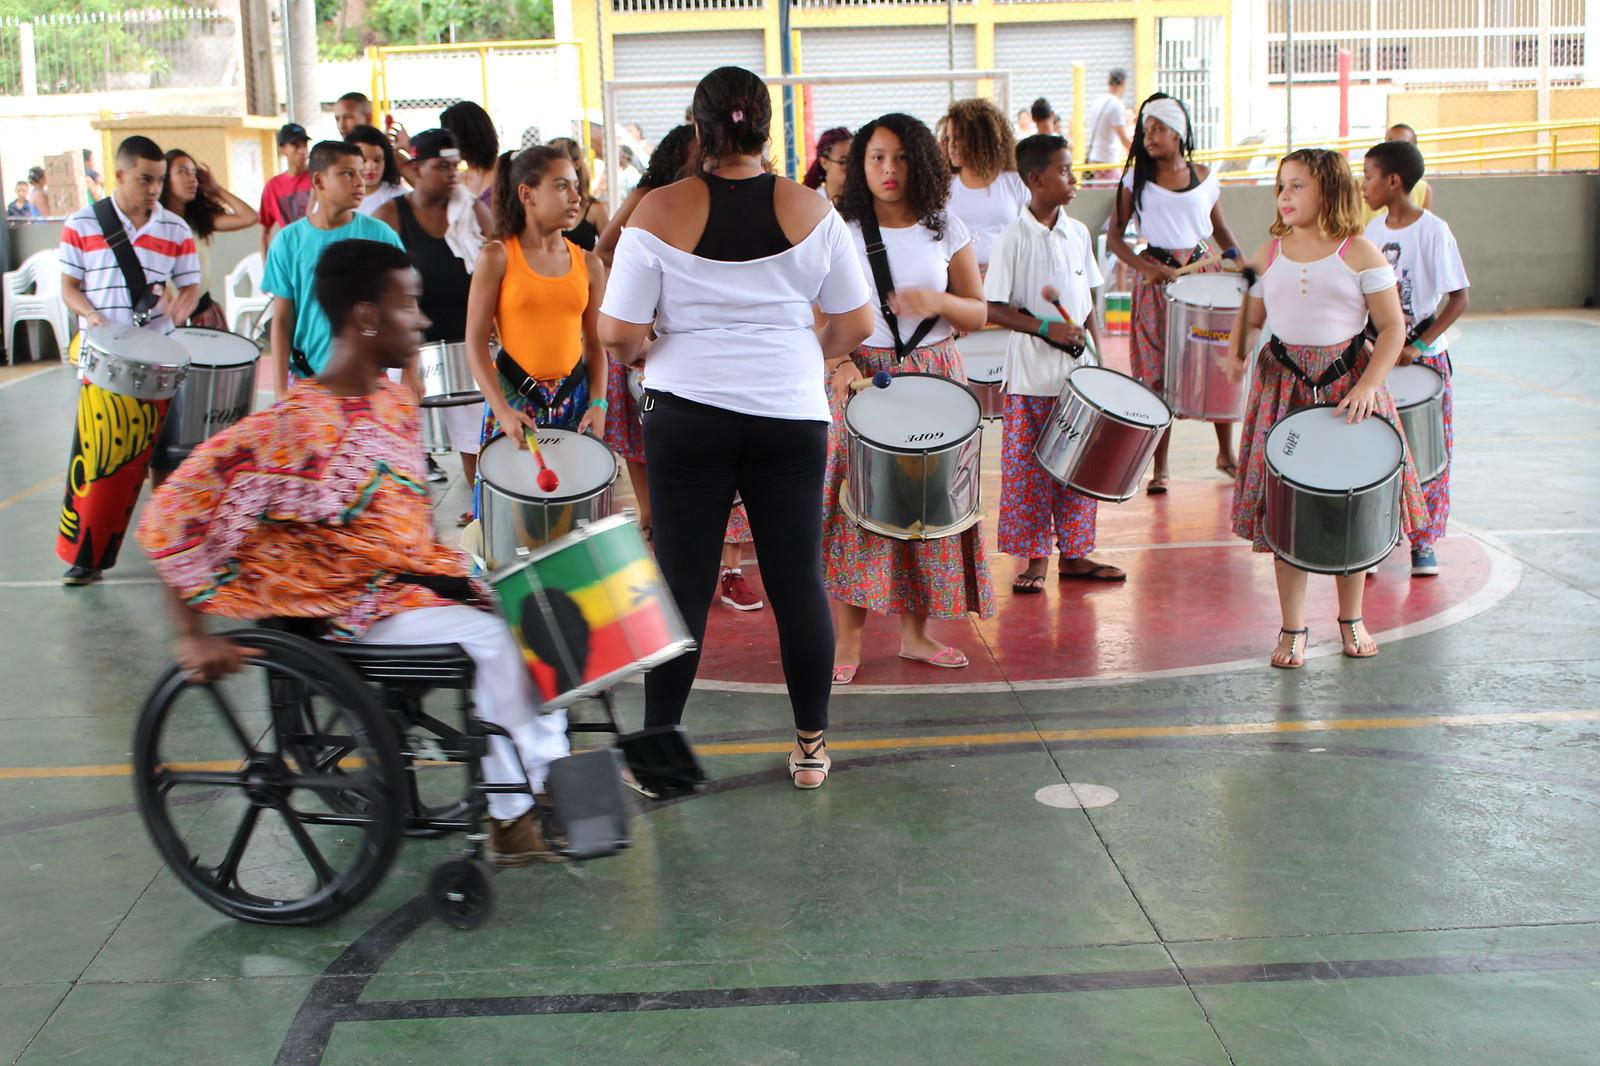 Bloco da Lona - Carnaval 2017 - Circo Escola Grajaú